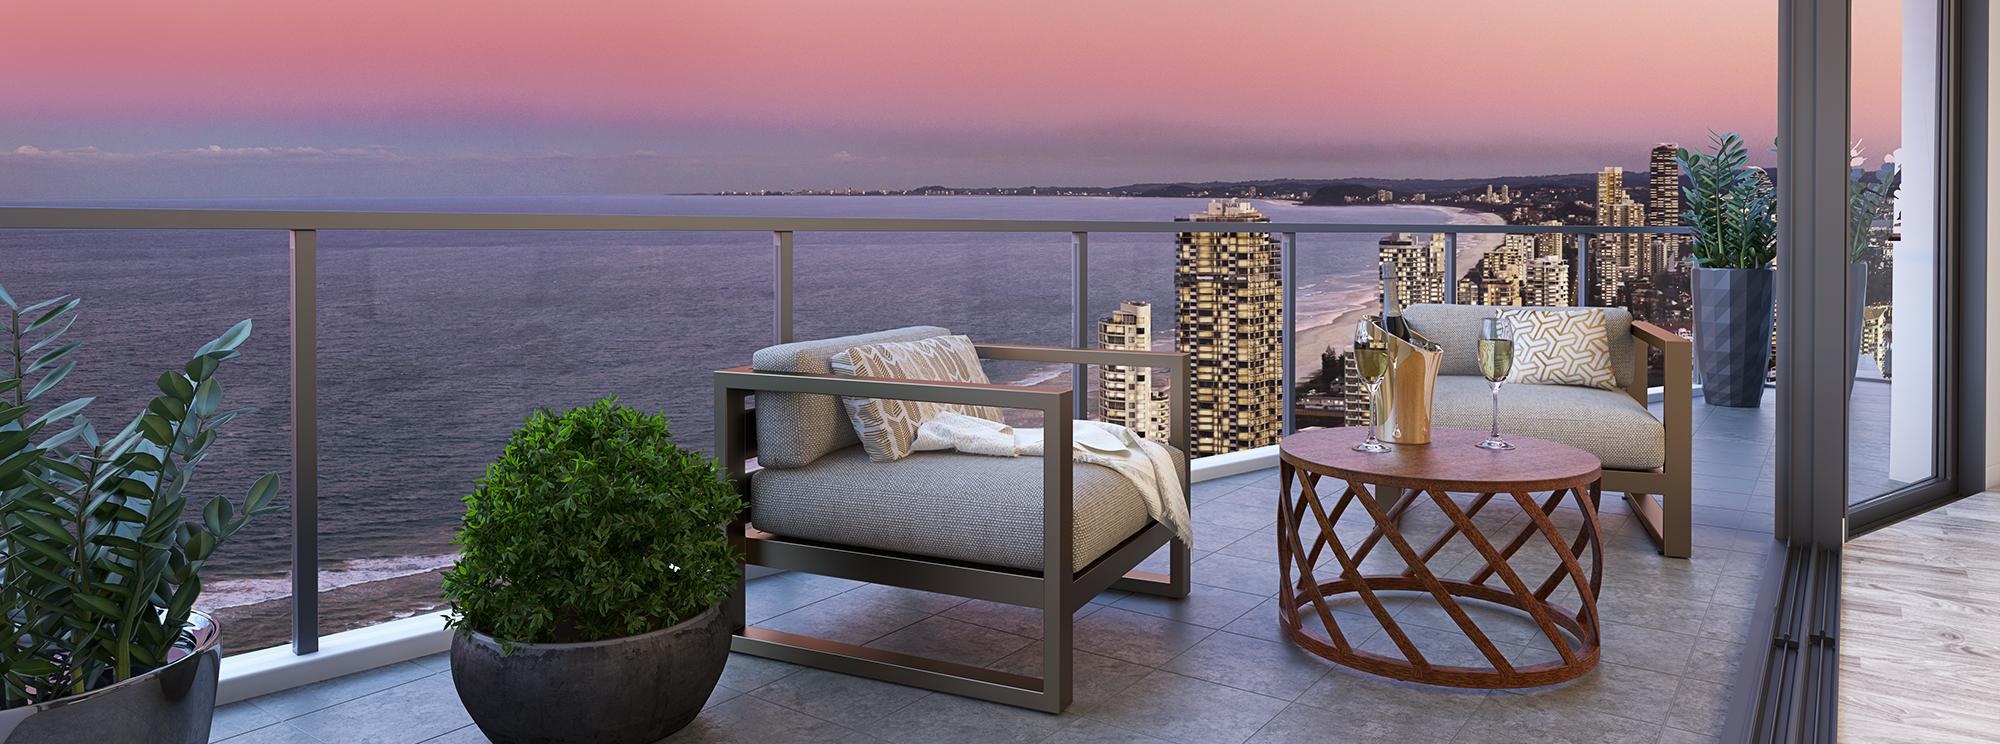 Grandeur-Balcony_LR_Markwell2